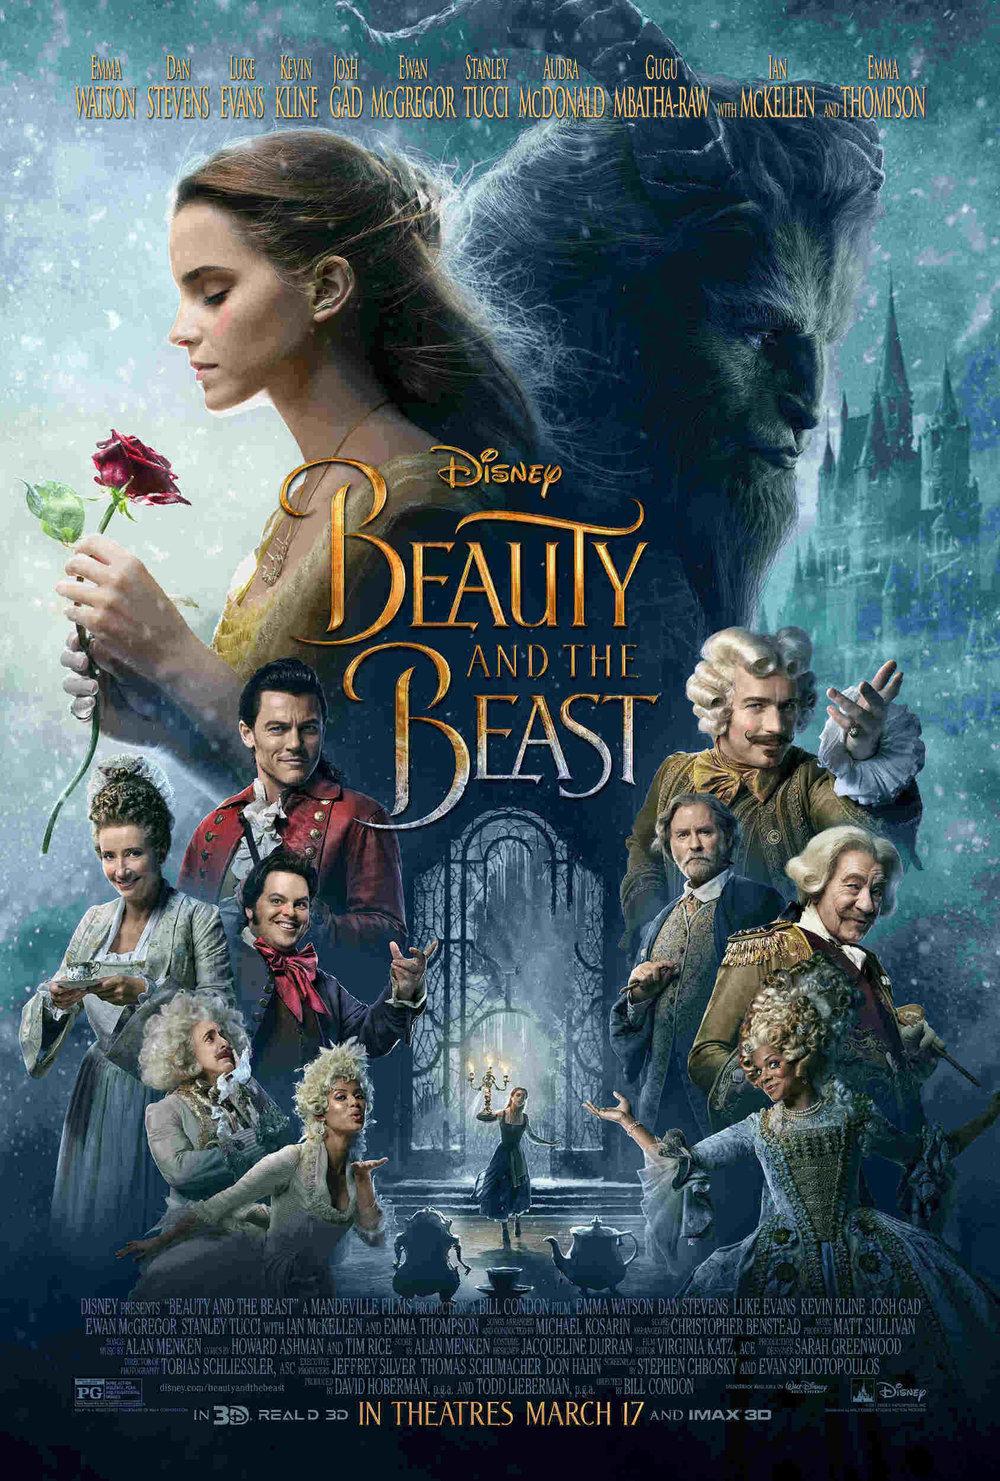 rsz_beautyandthebeast_film_payoff-poster.jpeg